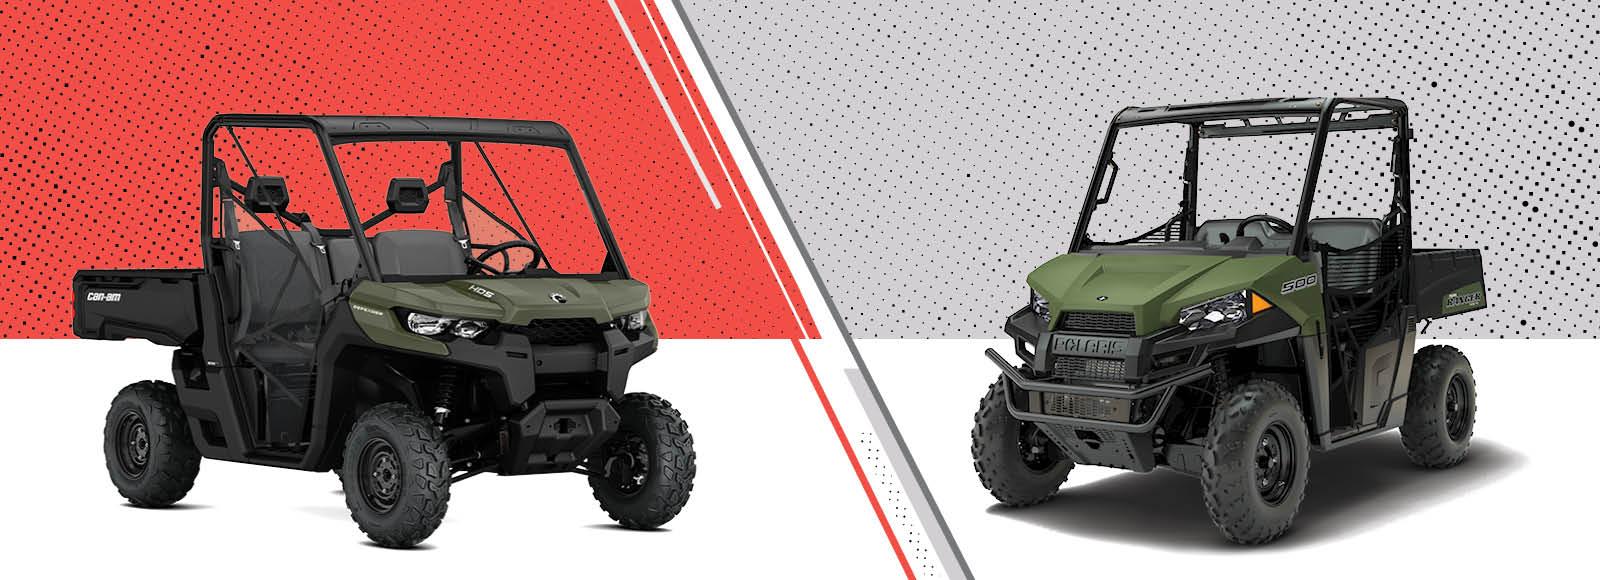 Side by Side UTV Review: CanAm Defender HD5 vs Polaris